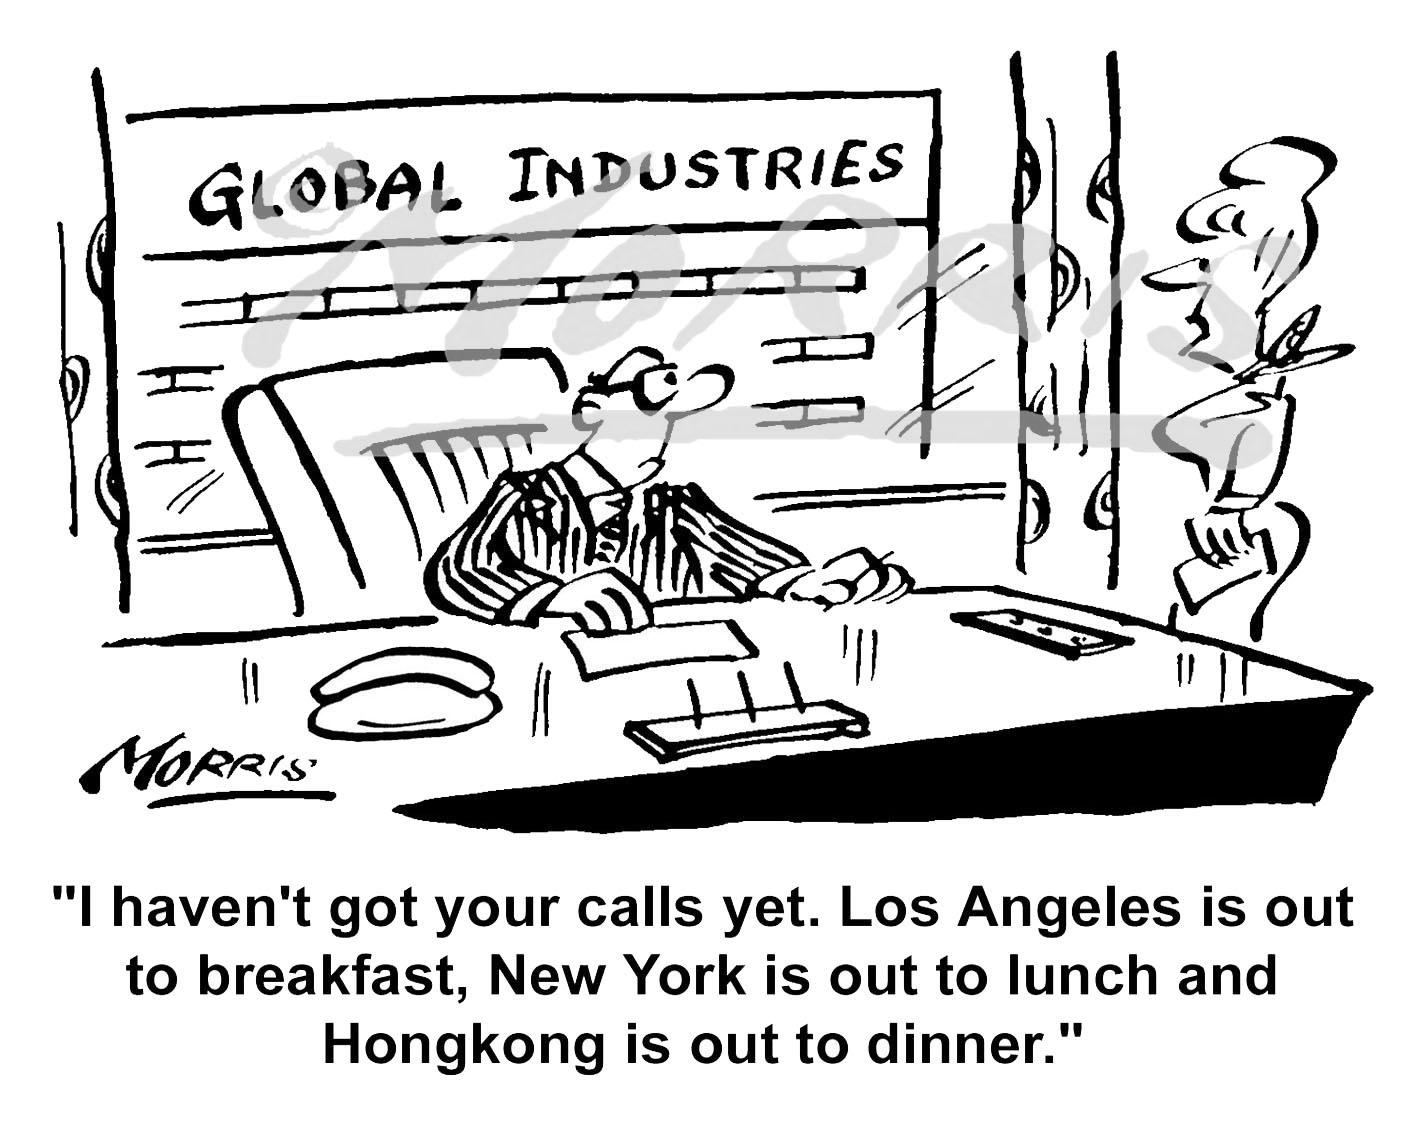 President / Chairman comic business cartoon – Ref:1657bw